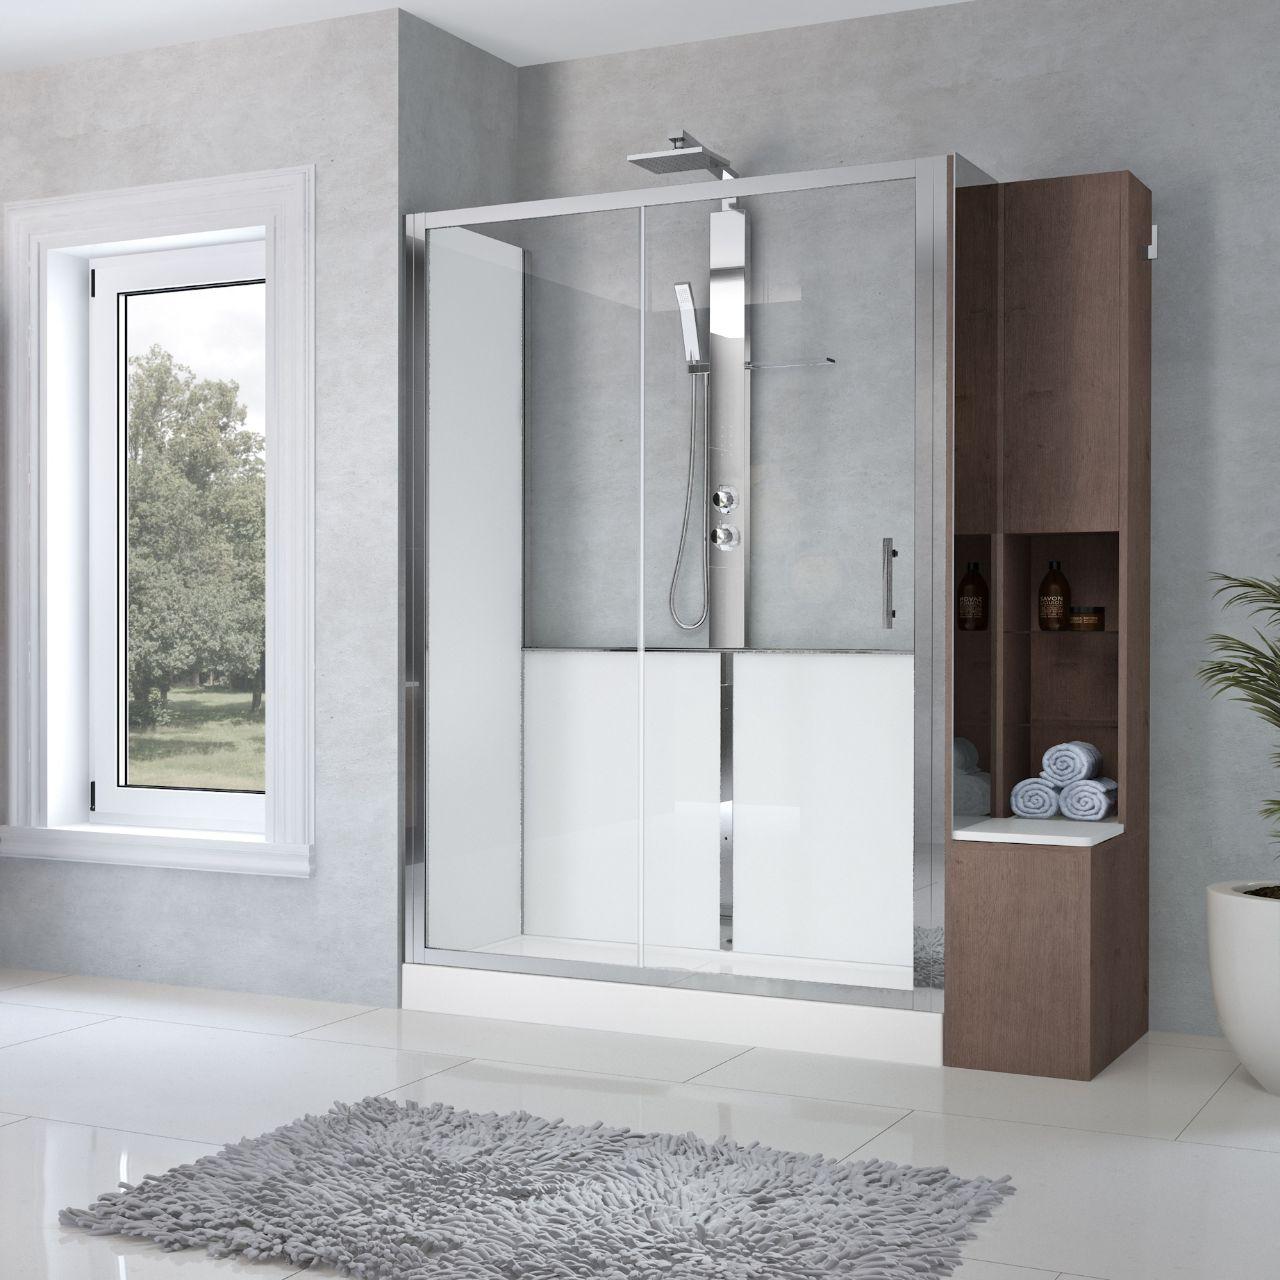 cabine doccia revolution 2 2p novellini. Black Bedroom Furniture Sets. Home Design Ideas